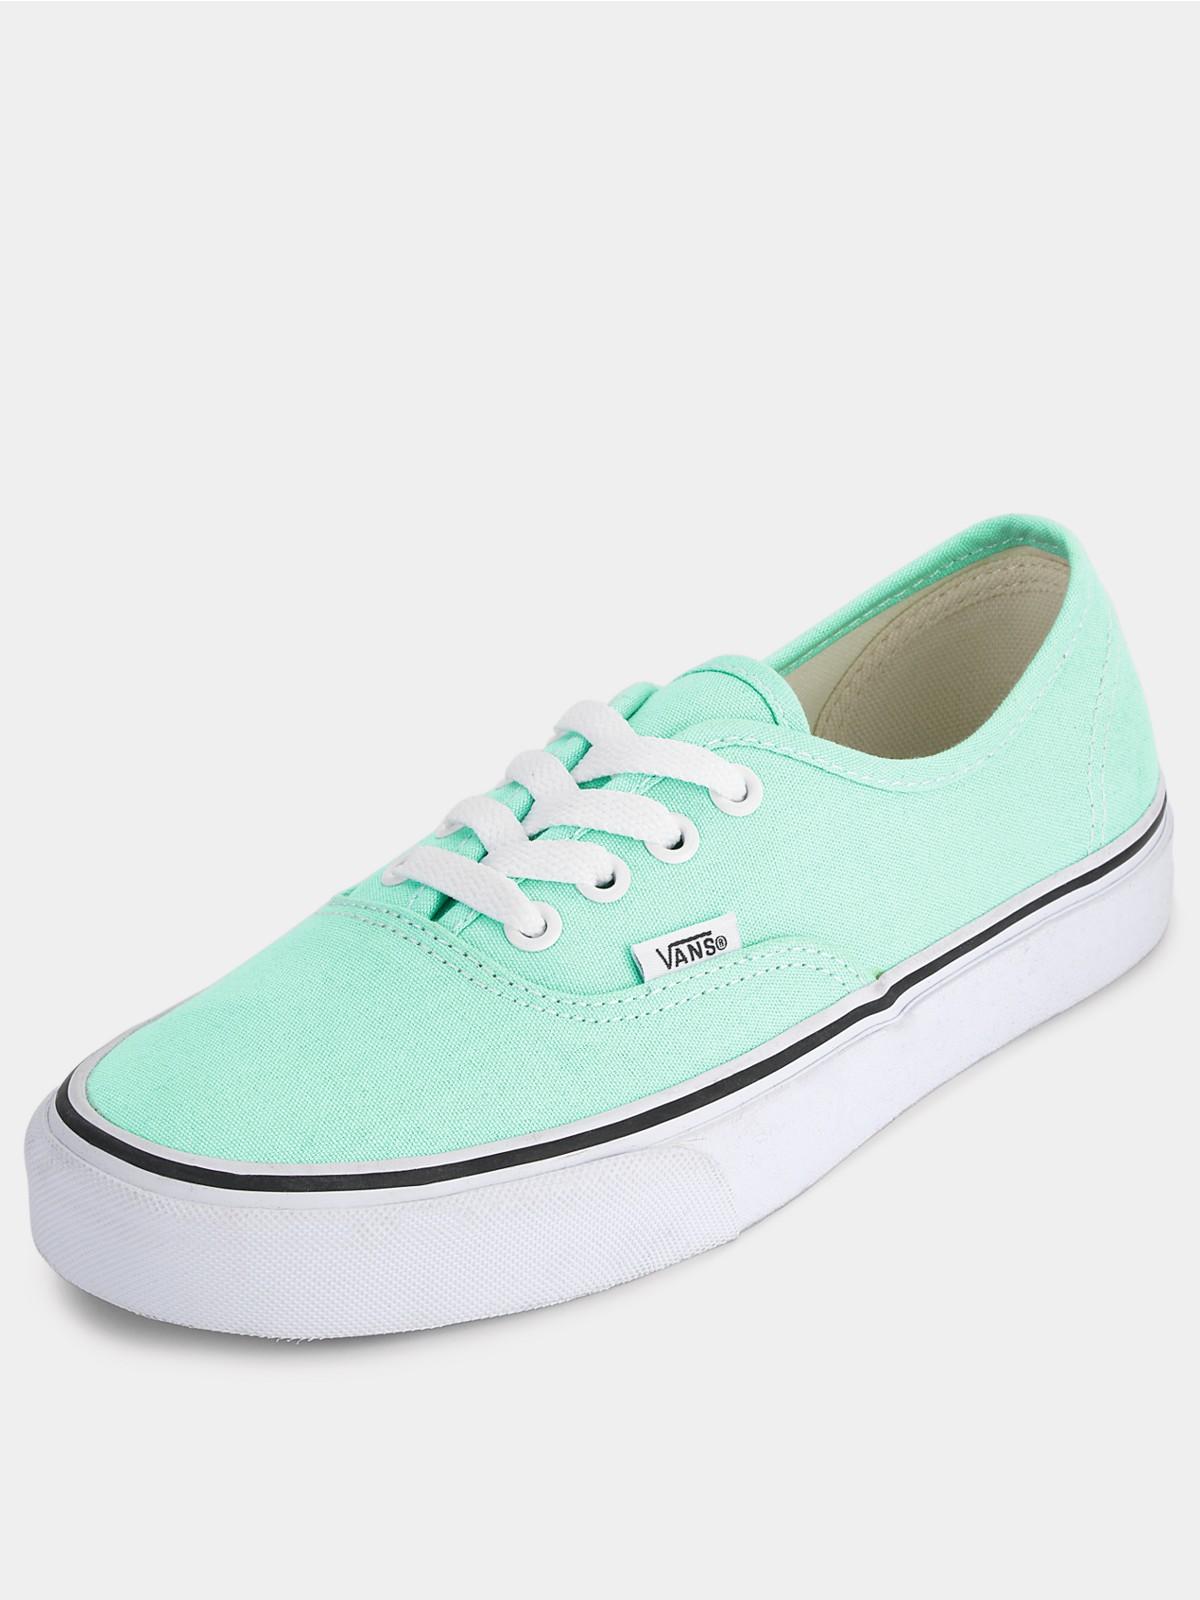 Mint Womens Shoes